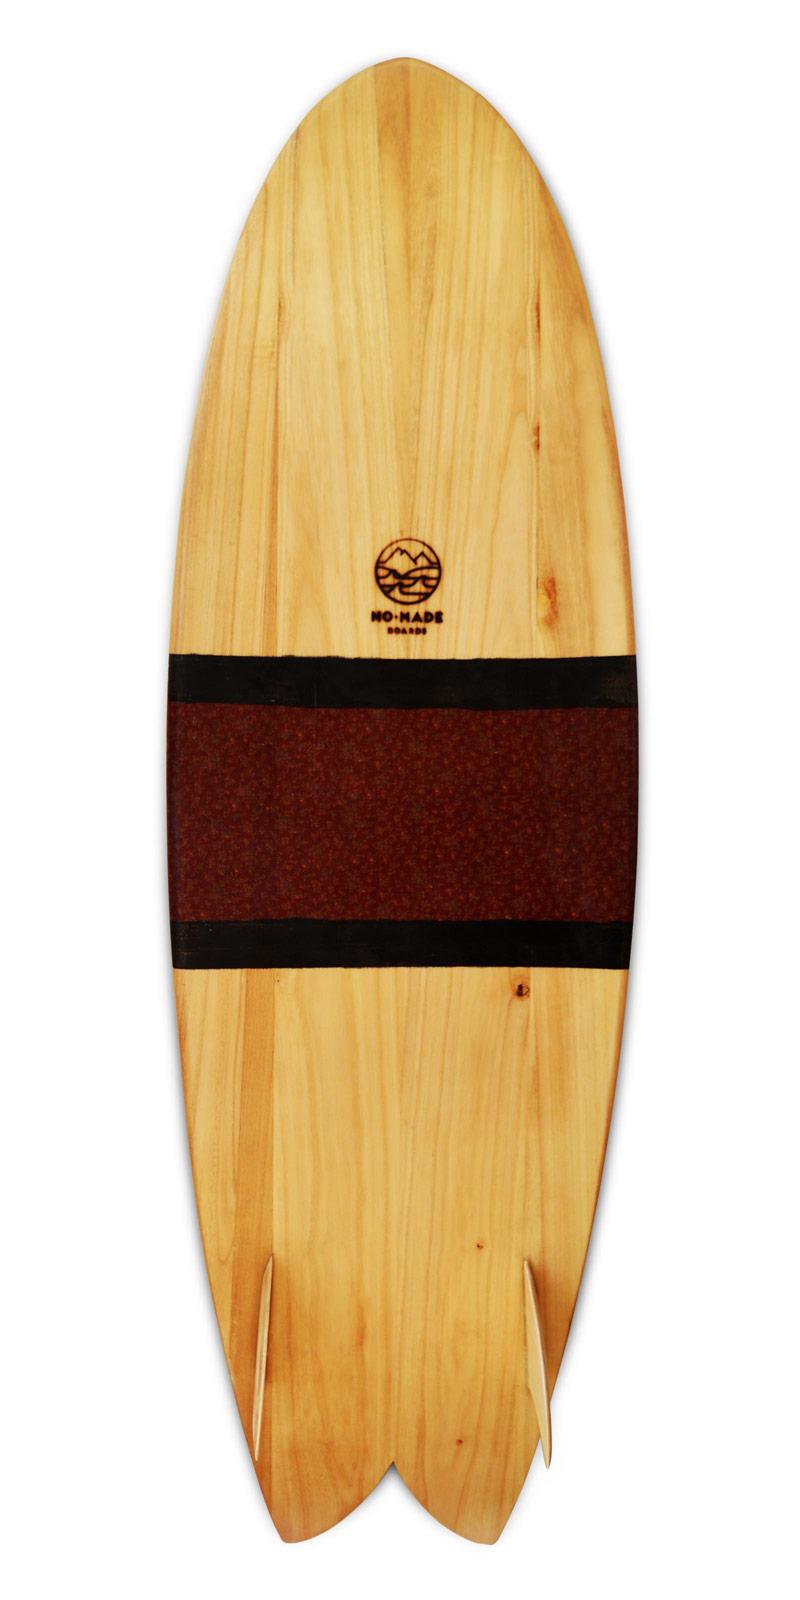 papalina wooden surfboard